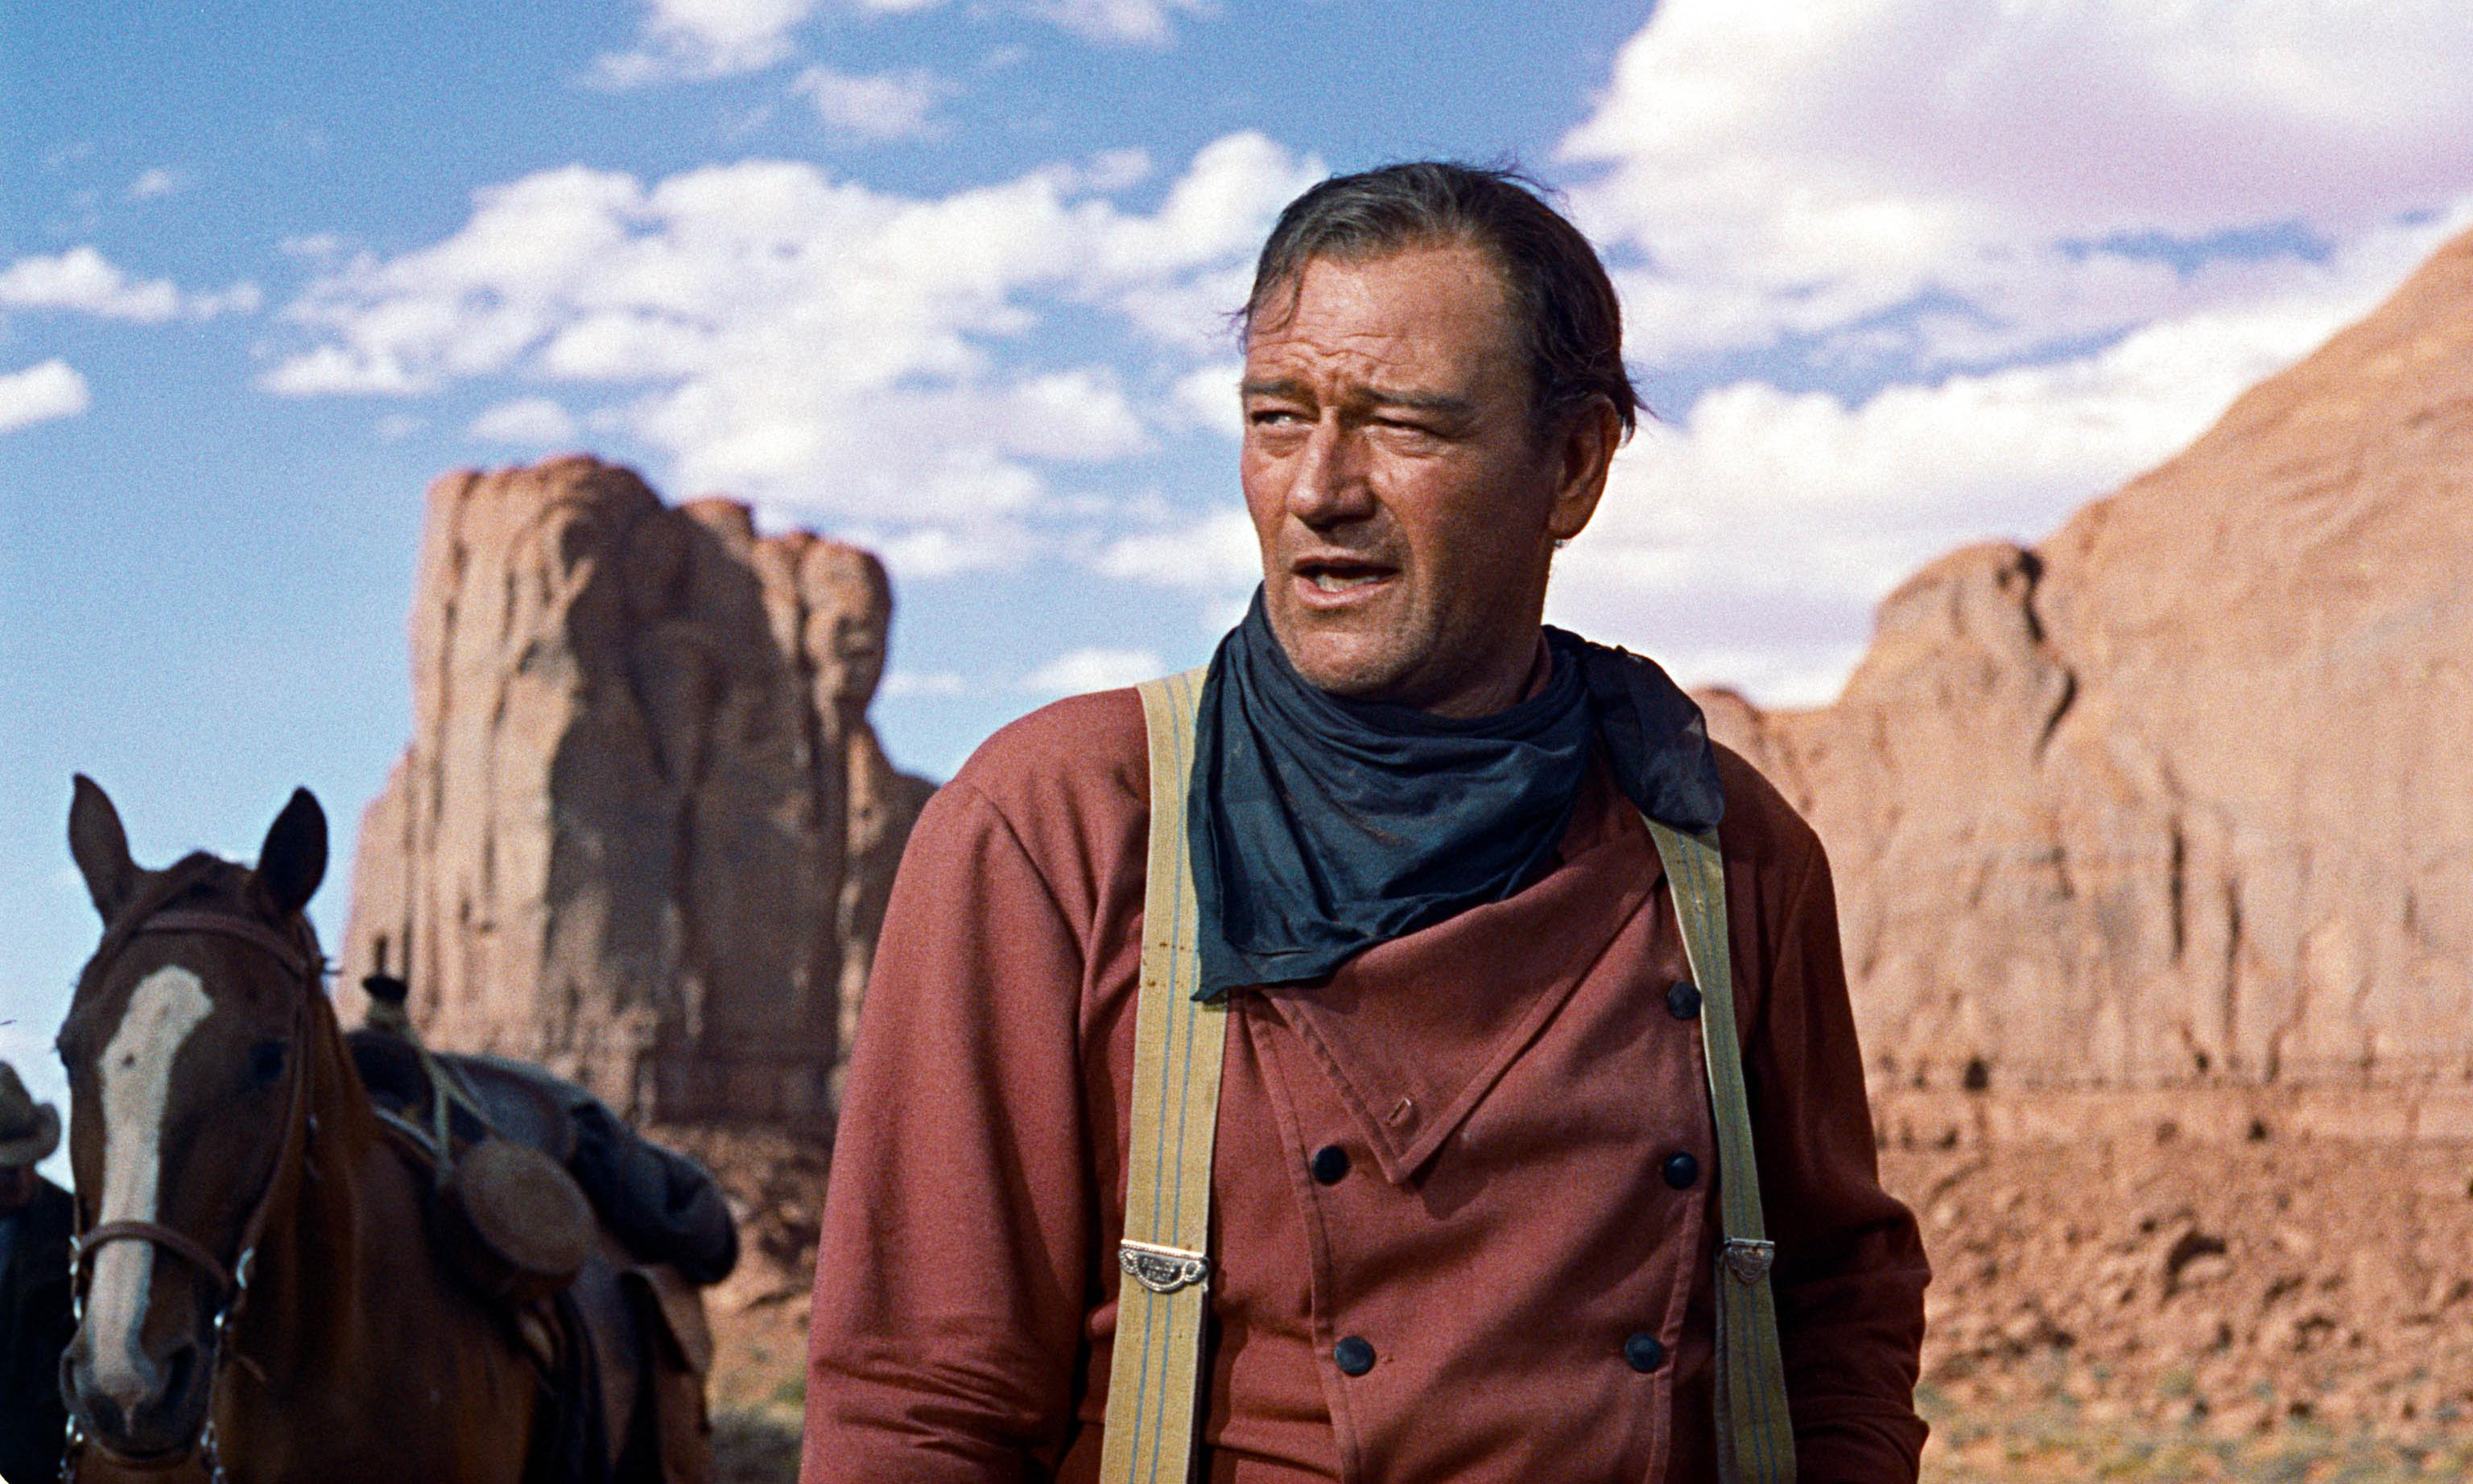 Should we be surprised by John Wayne's racist and homophobic views?